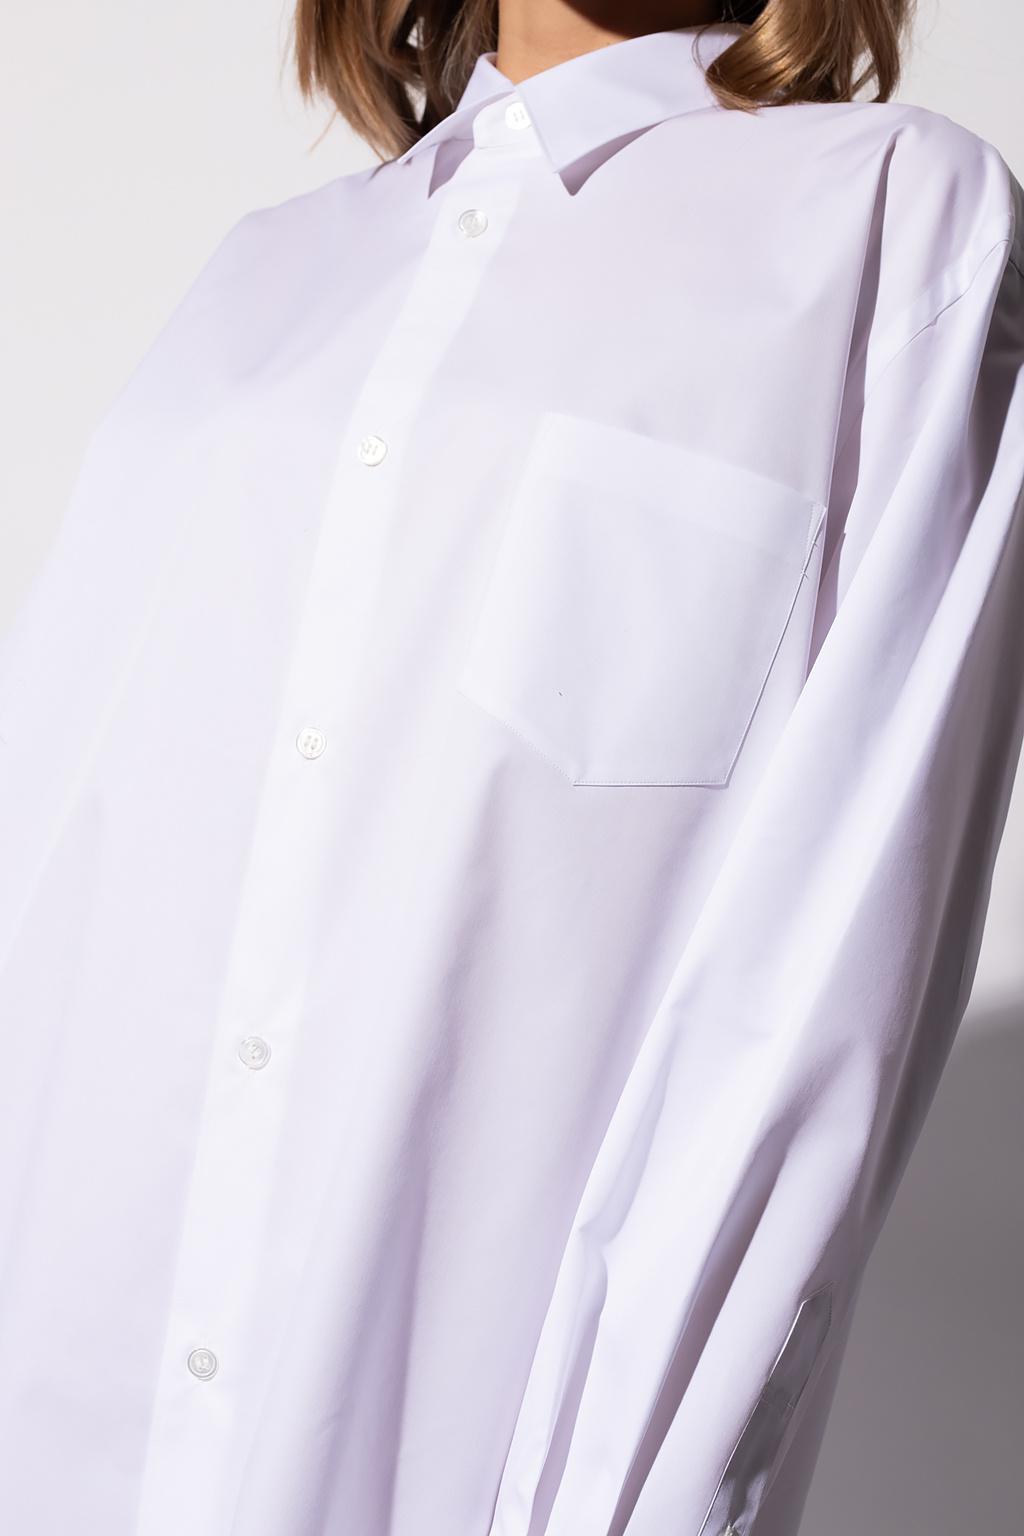 Junya Watanabe Comme des Garcons Długa koszula typu 'oversize'